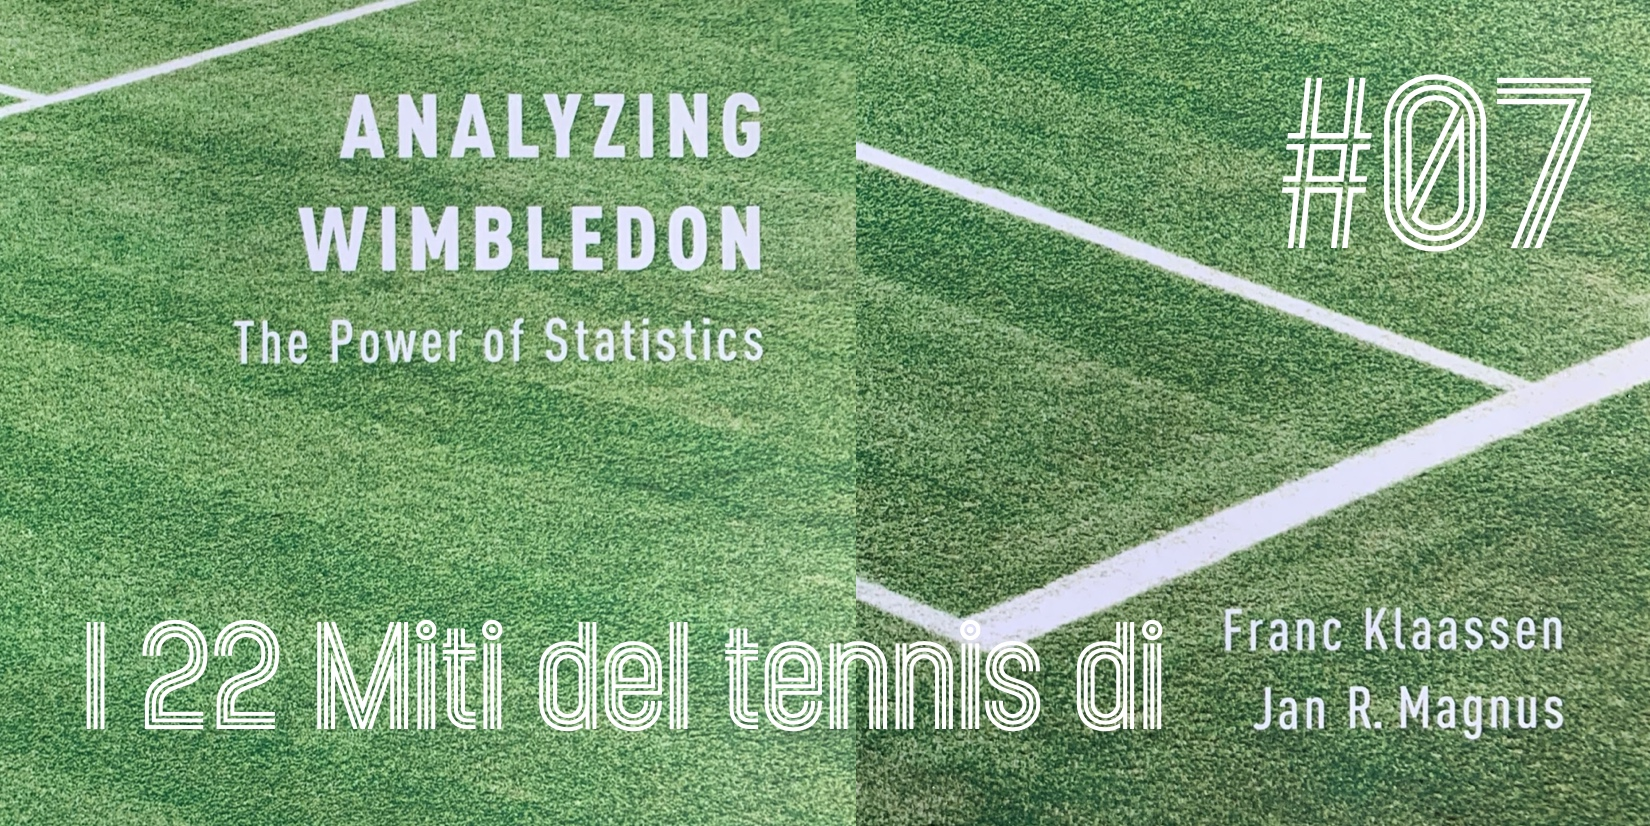 I 22 miti del tennis di Klaassen & Magnus – Mito 7 - settesei.it